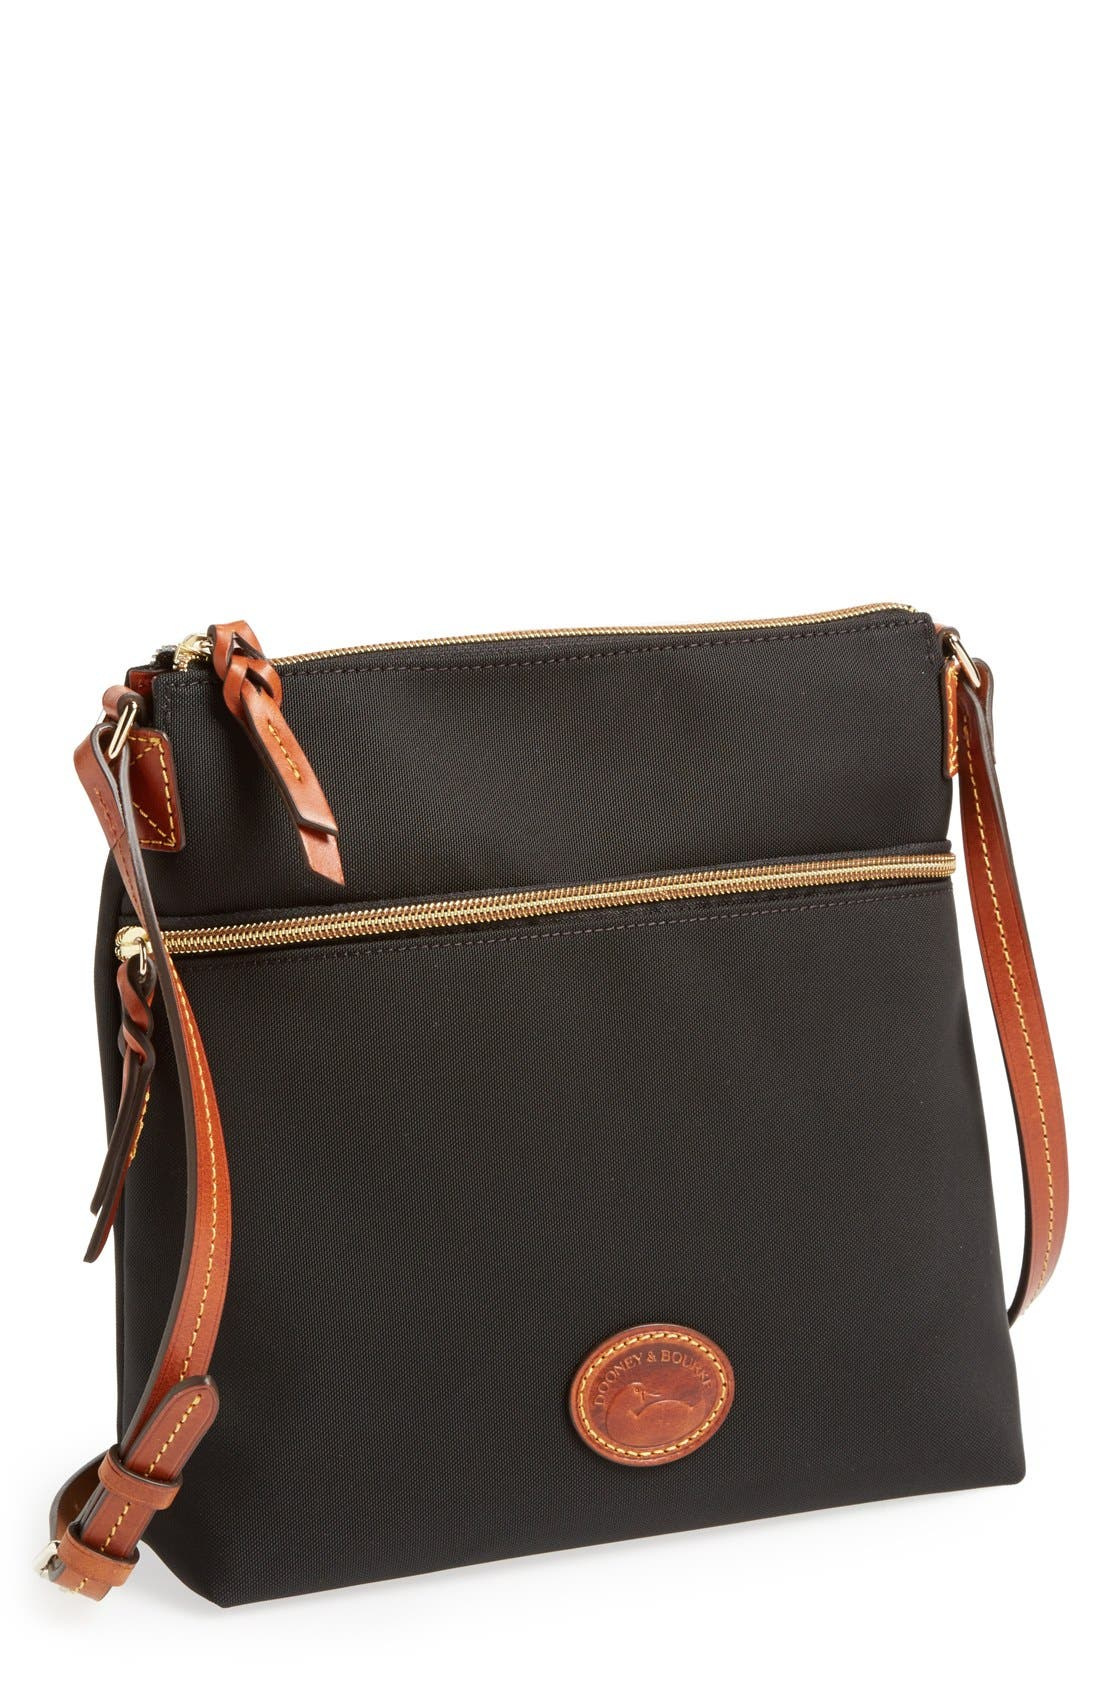 Main Image - Dooney & Bourke Crossbody Bag